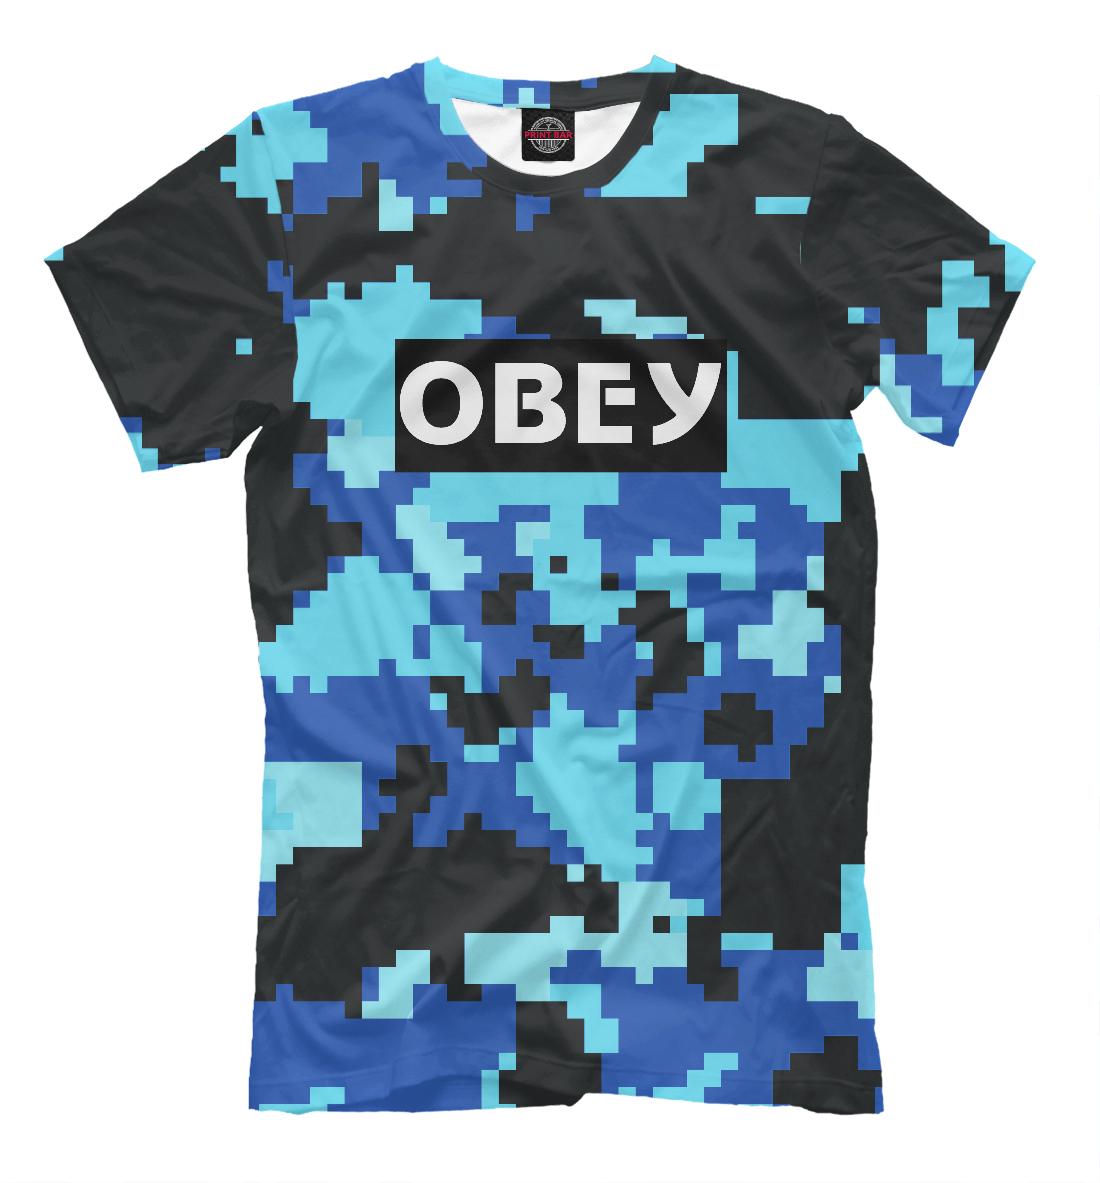 OBEY MILITARY FASHION, Printbar, Футболки, APD-880431-fut-2  - купить со скидкой